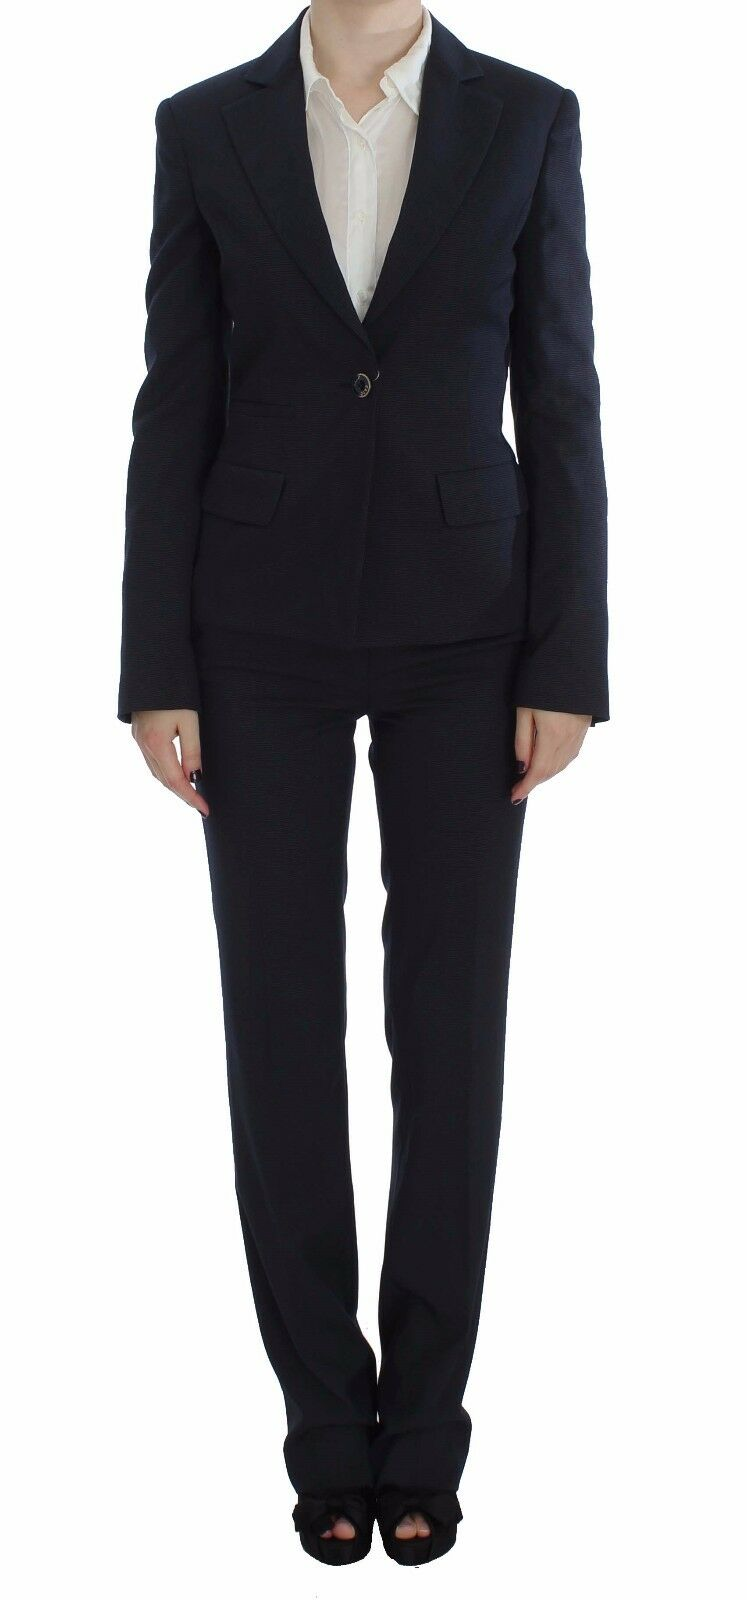 NEW EXTE Suit Pants Blazer Two Piece One Button bluee Stretch IT48  US14 XL